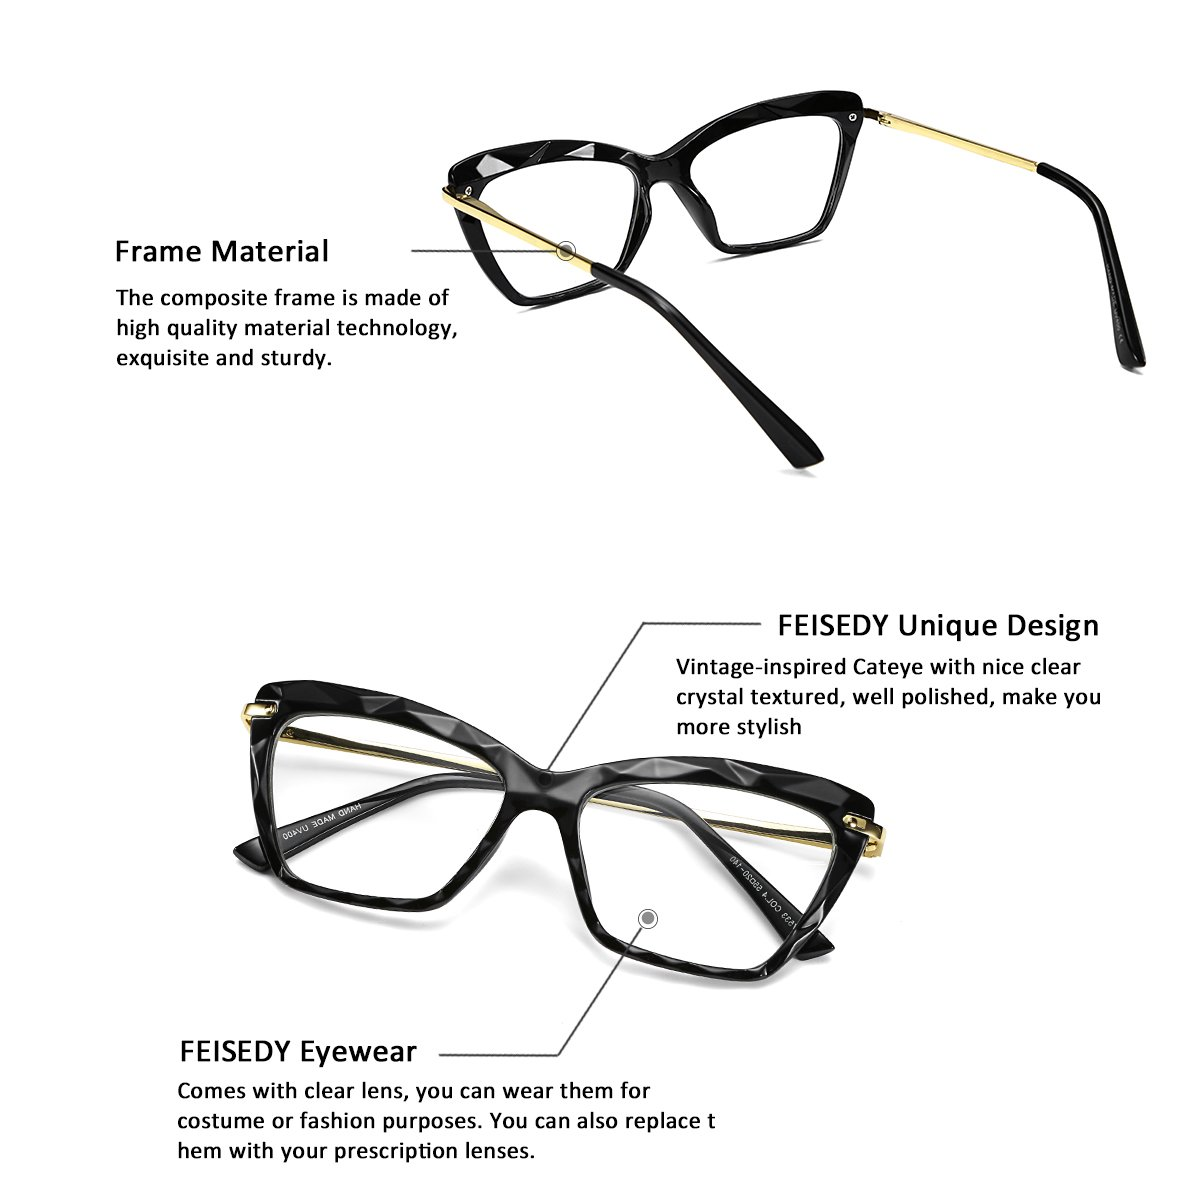 276963cd9791 Amazon.com: FEISEDY Cat Eye Glasses Frame Crystal Non Prescription Eyewear  Women B2440: Clothing